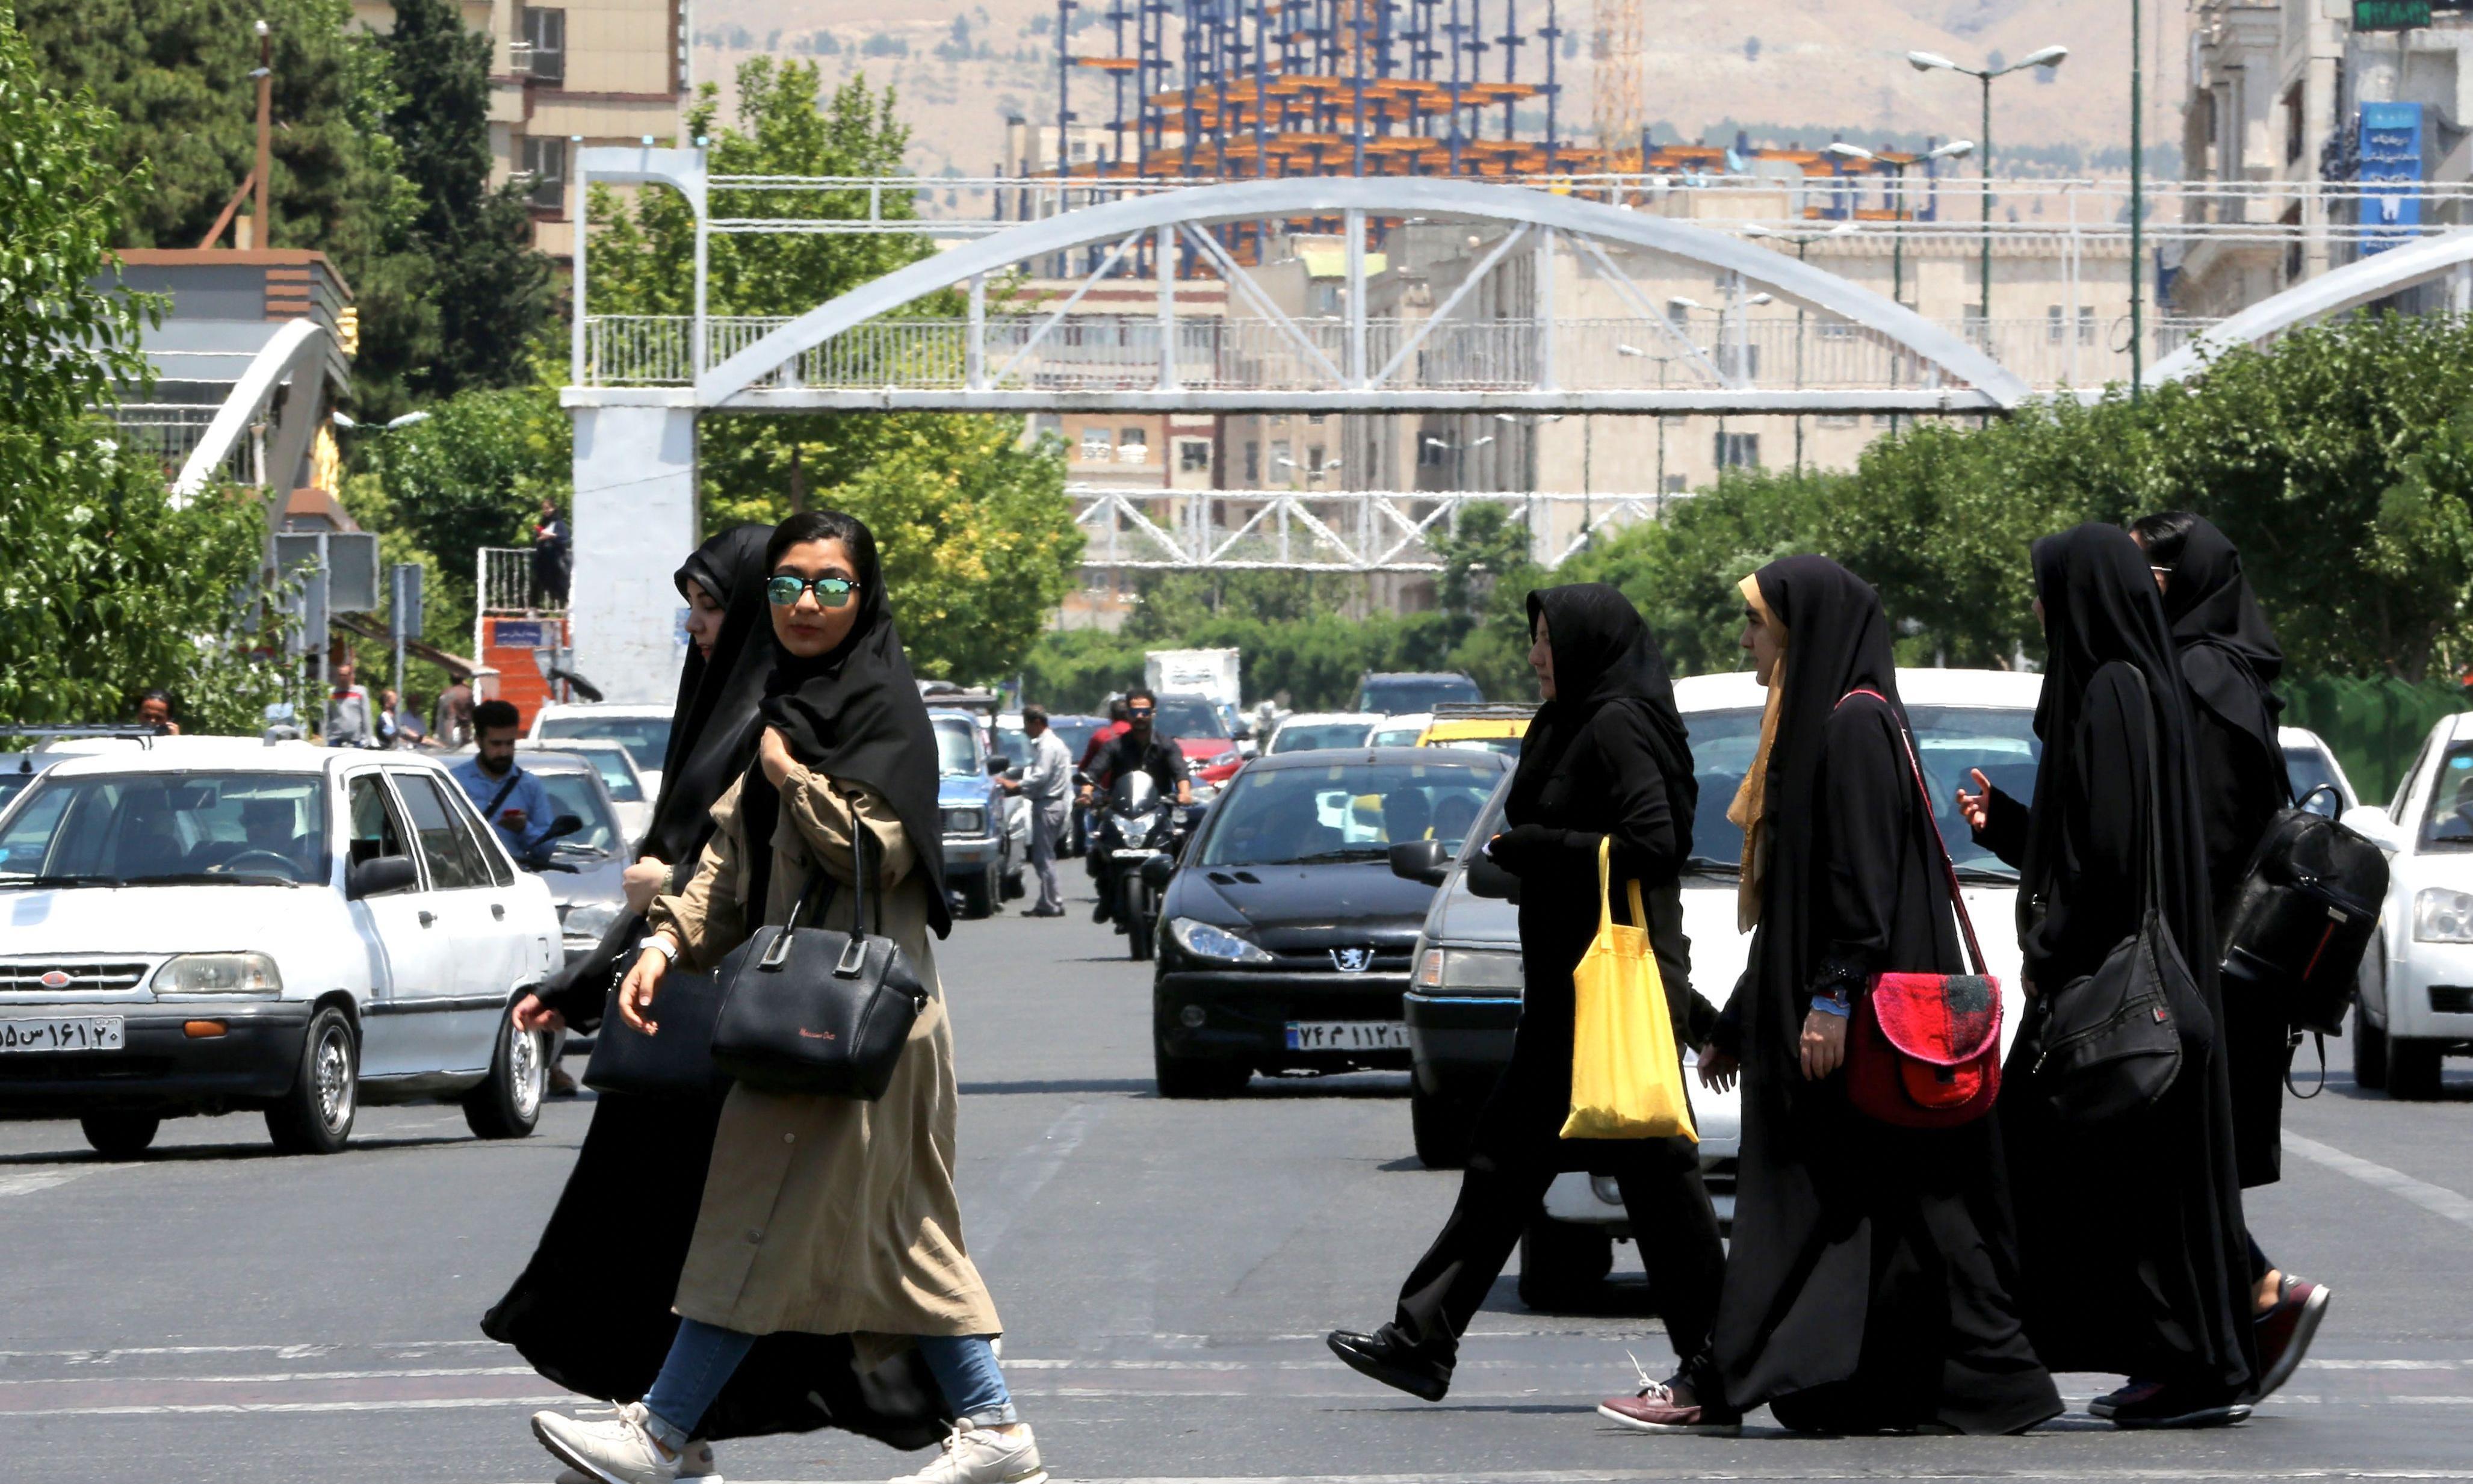 Tehran has held firm in its tussles with Trump